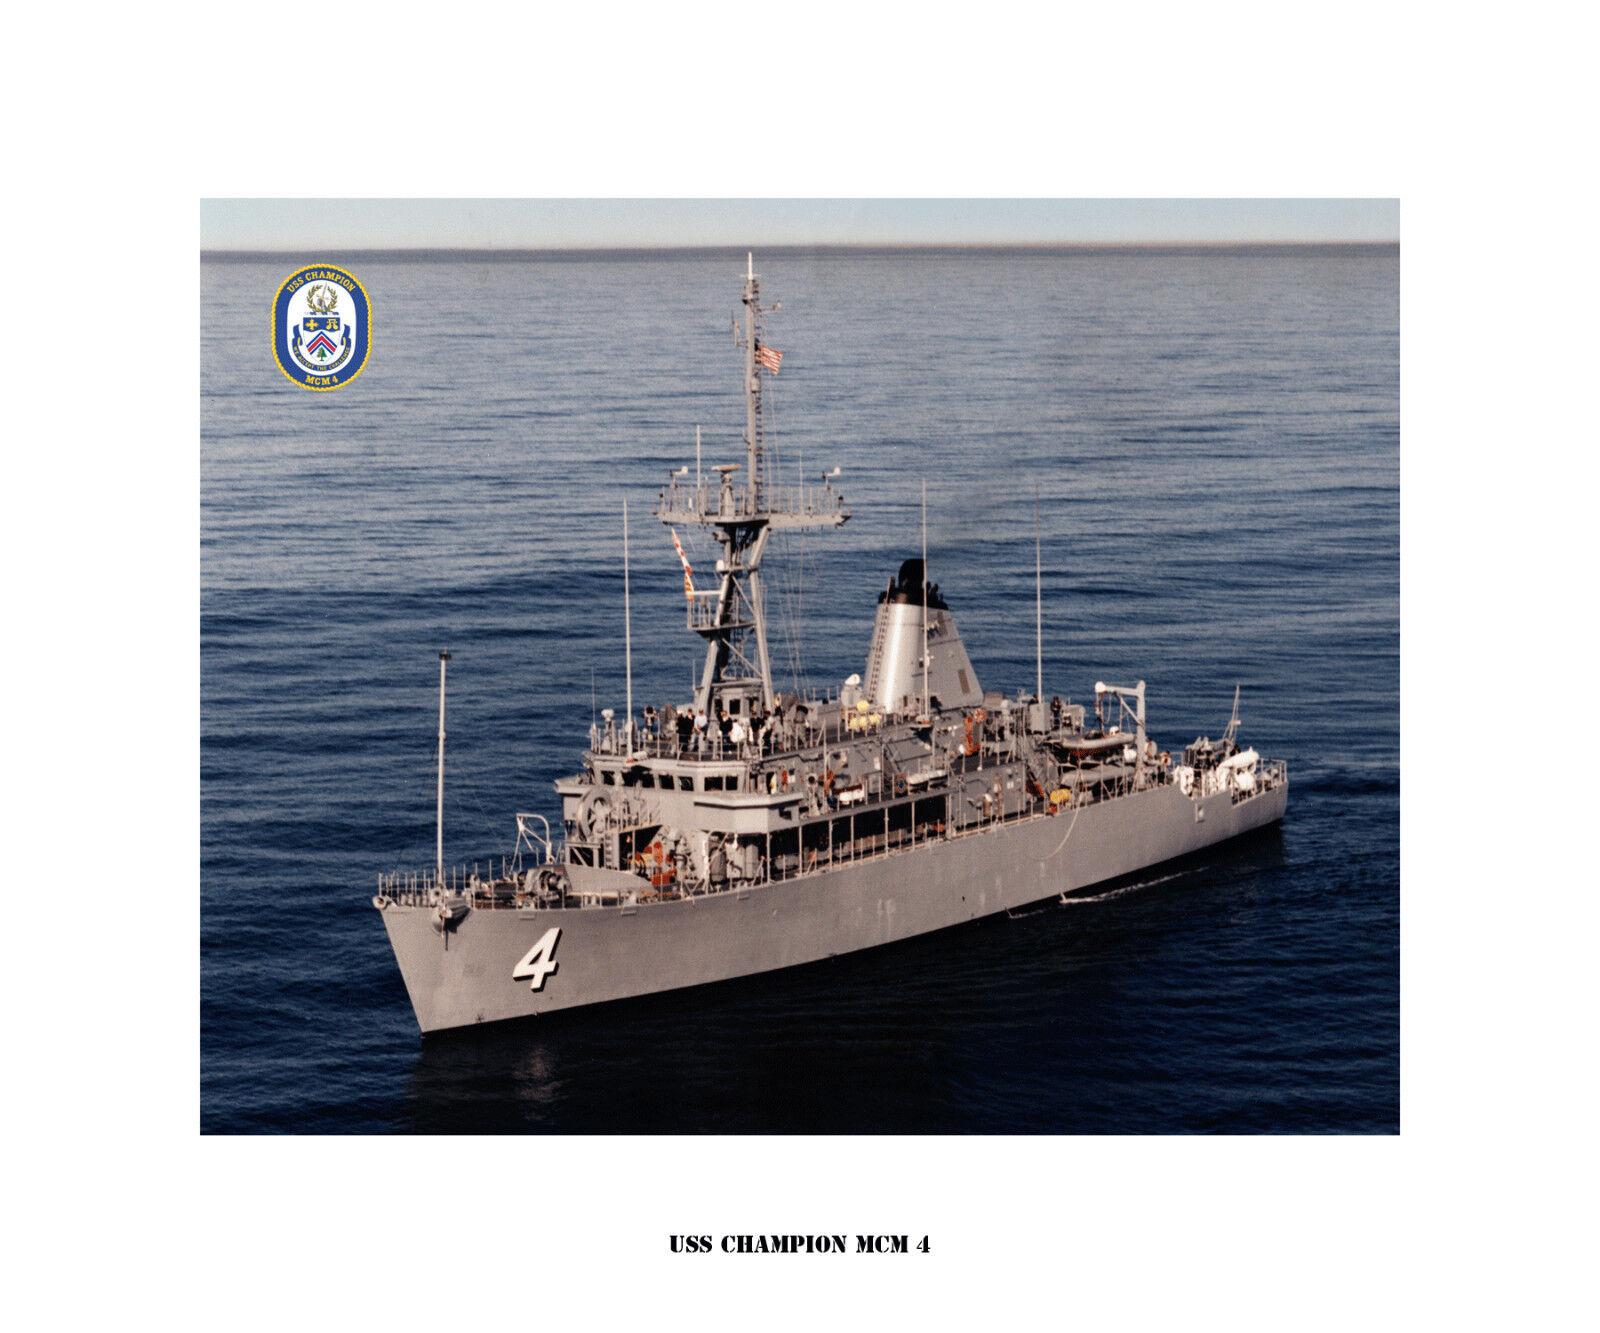 USS CHAMPION MCM 4  USN Naval Ship Photo Print